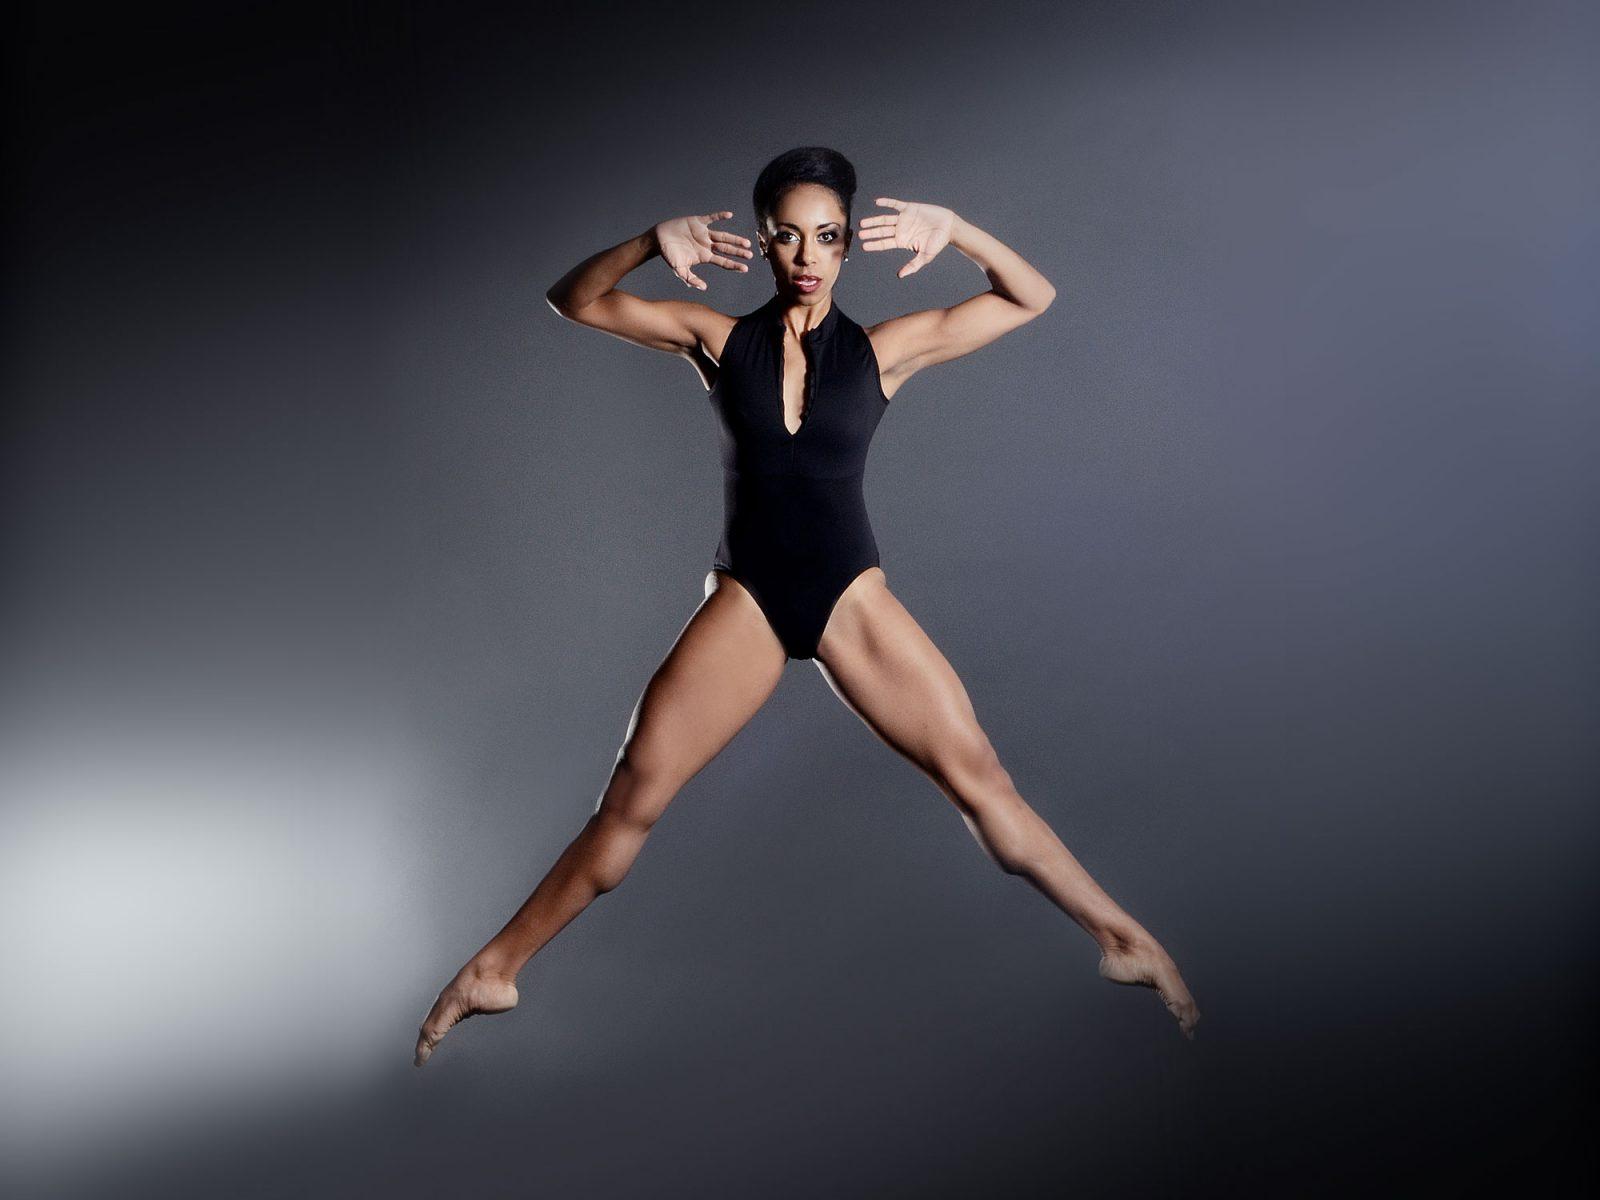 Dallas Black nude